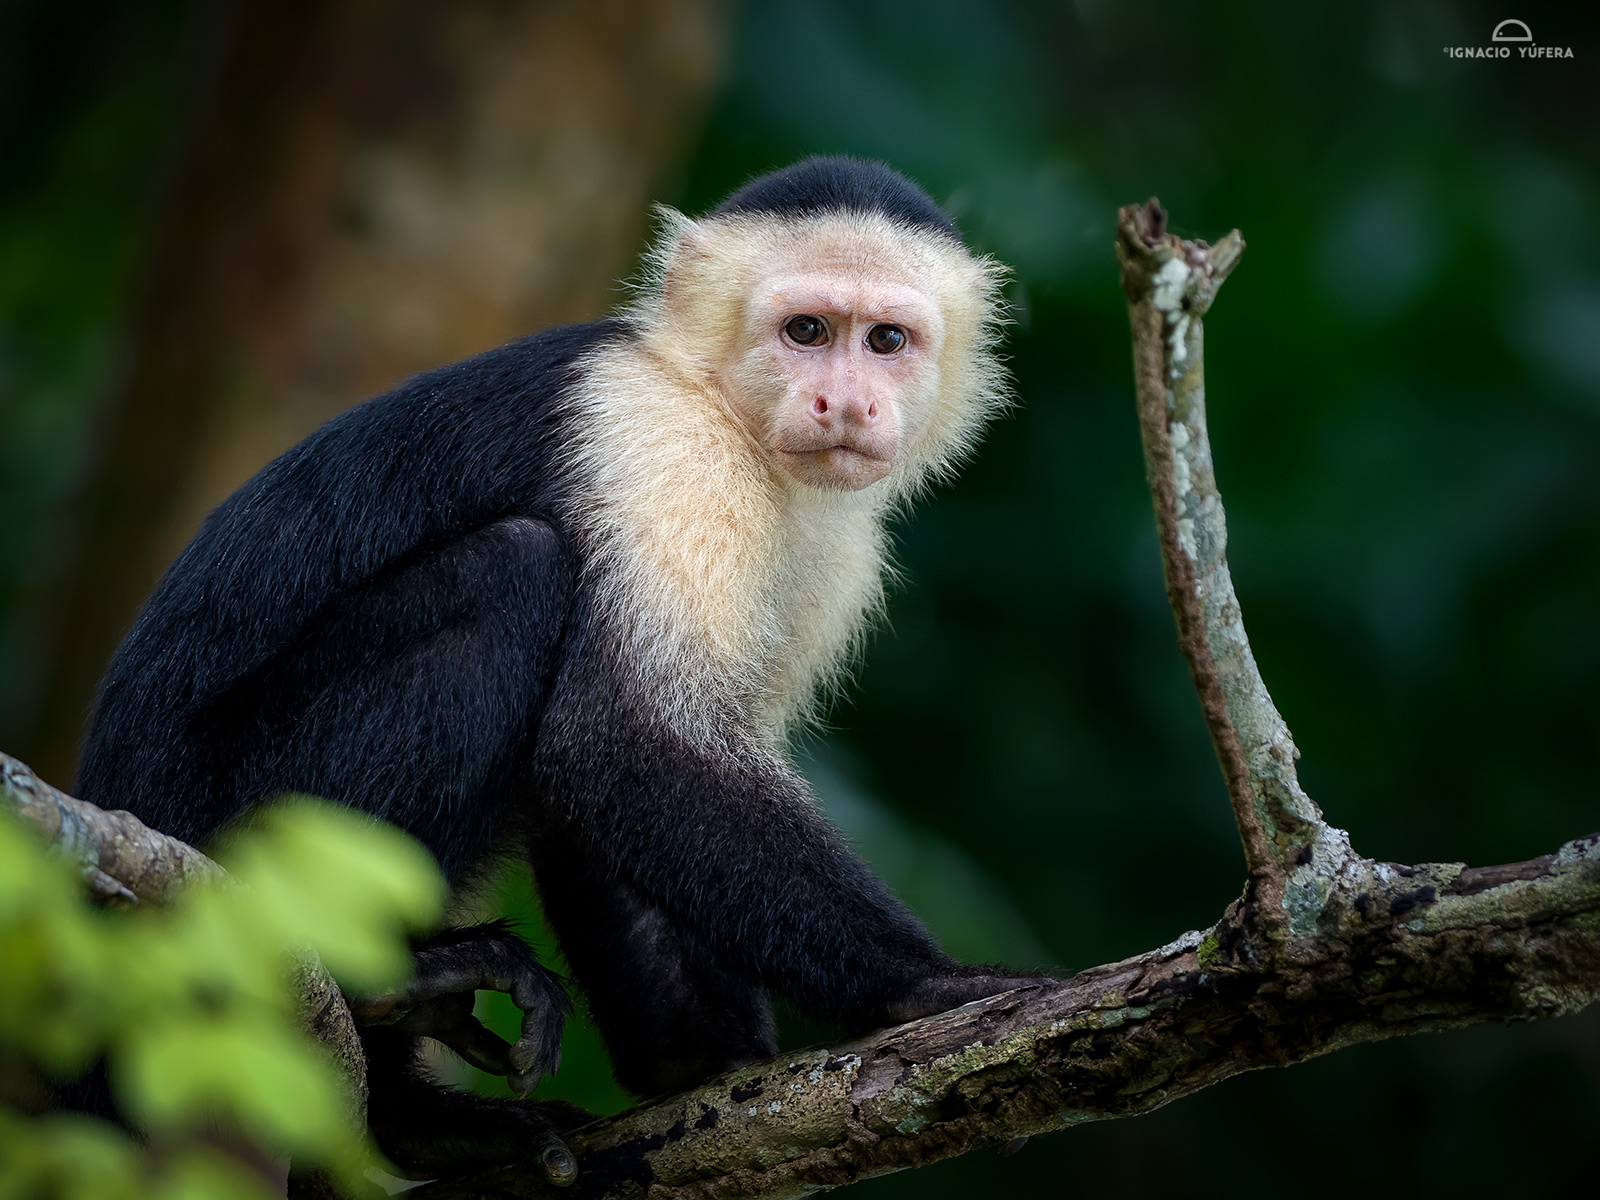 White-faced Capuchin (Cebus capucinus), Lake Gatún, Panama